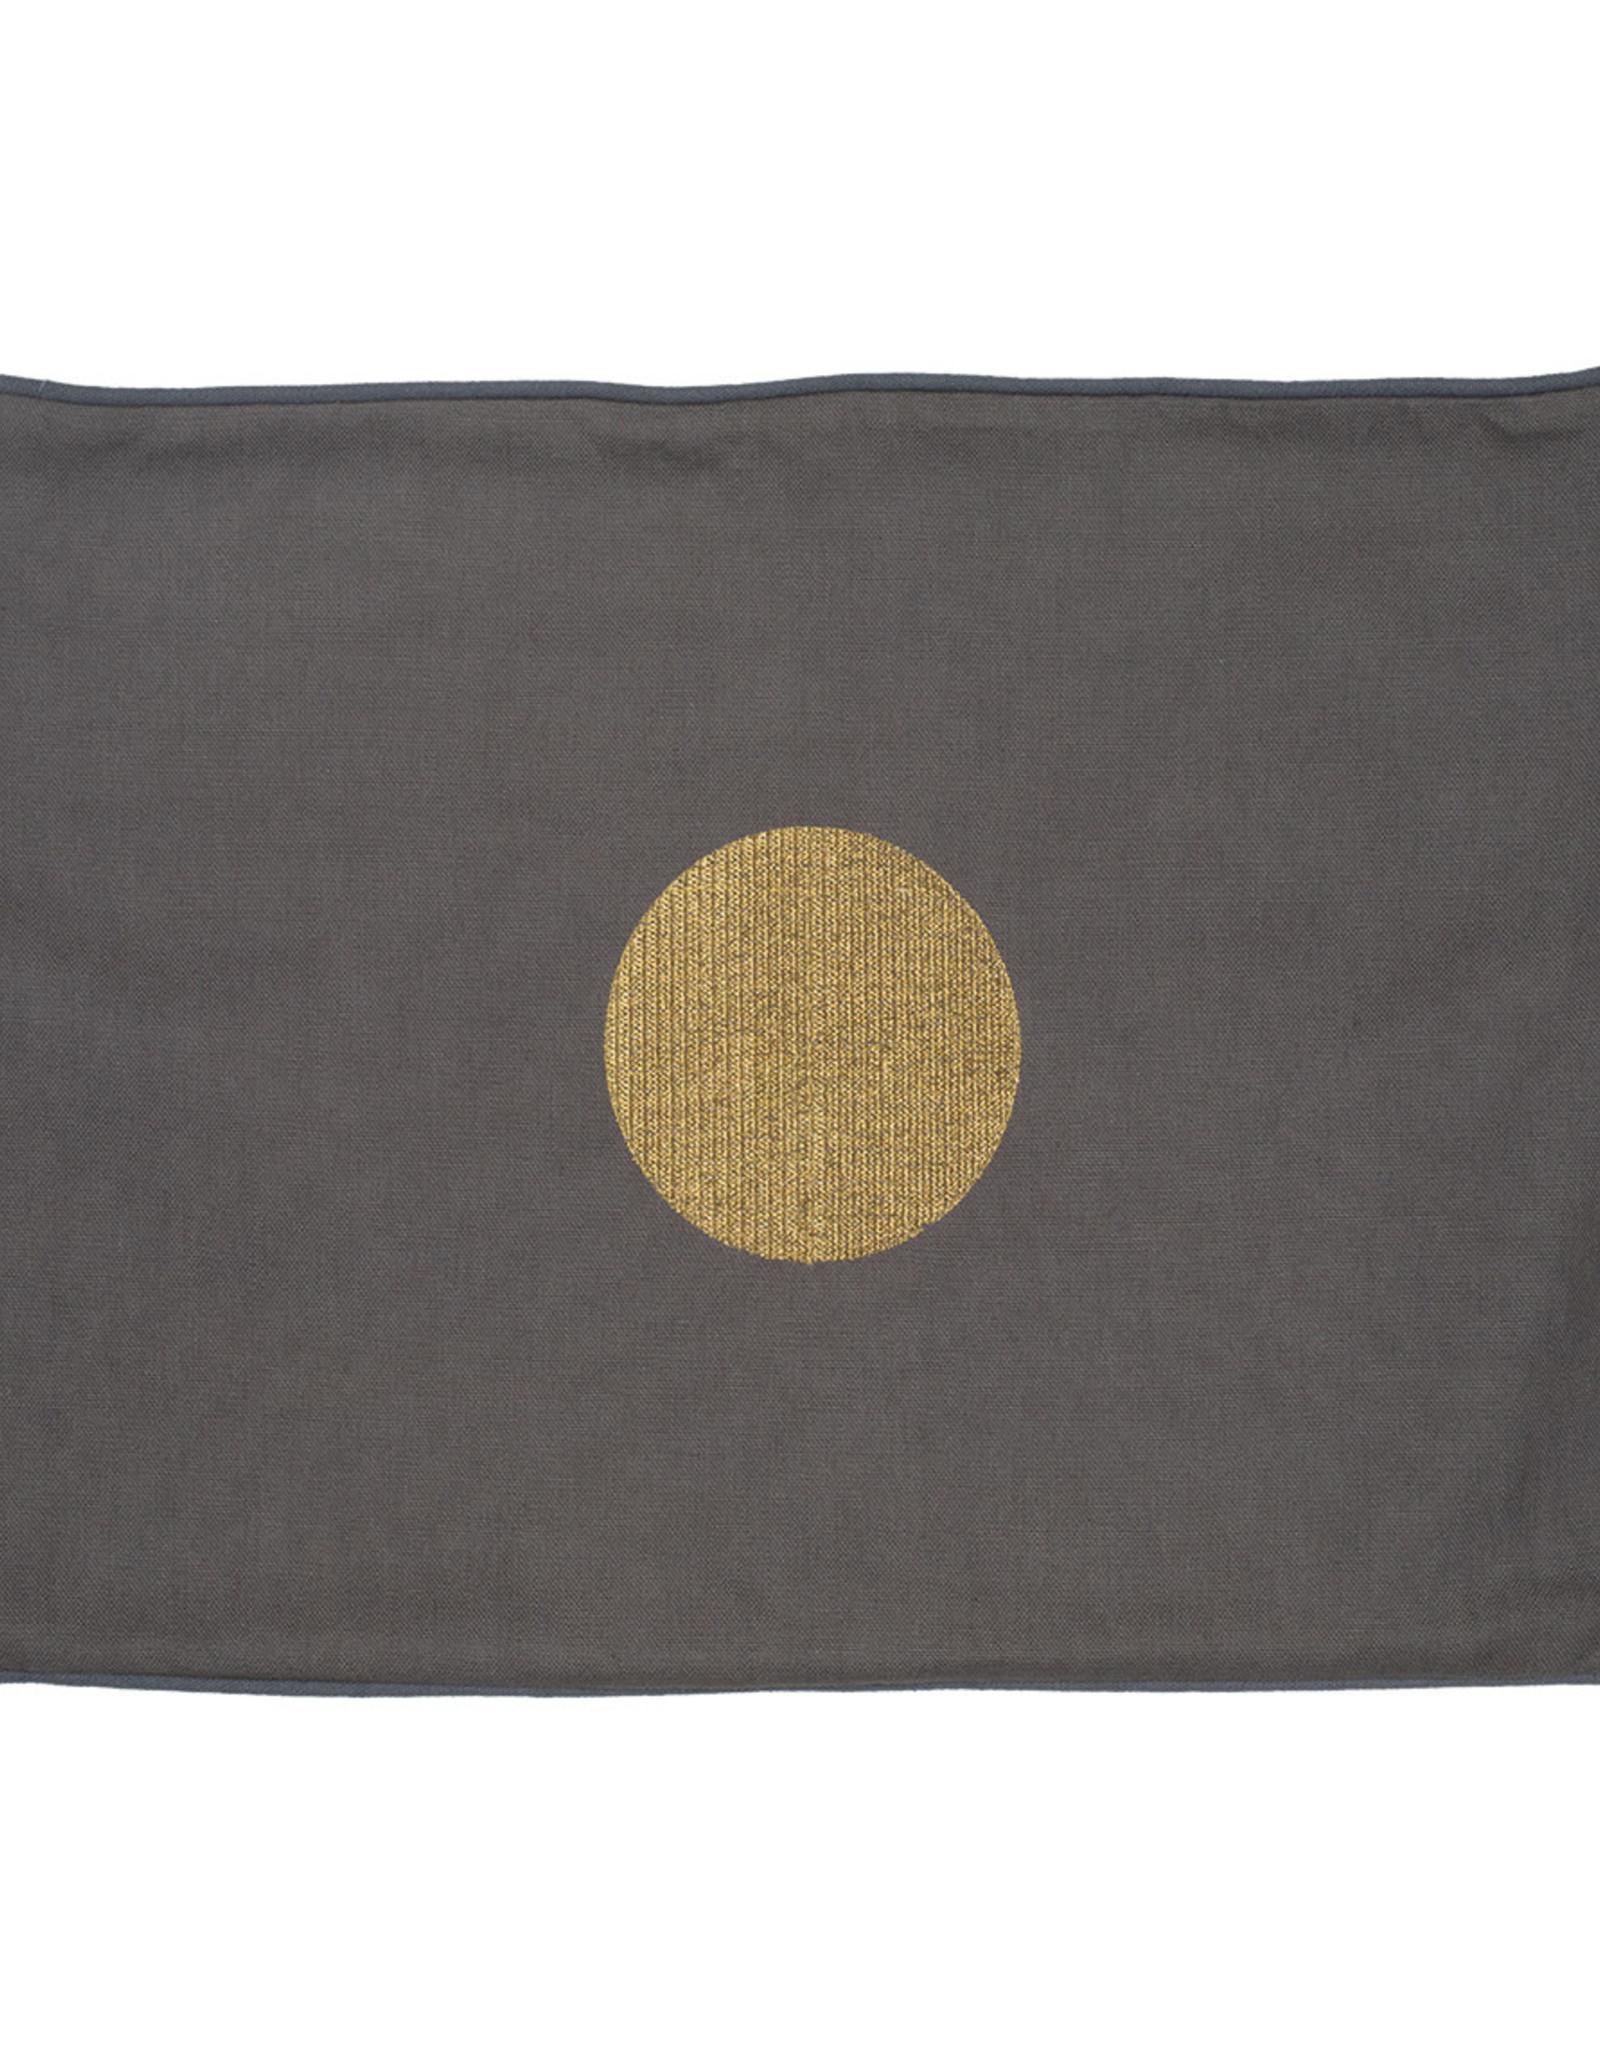 Räder Rader - At home  pillow golden dot